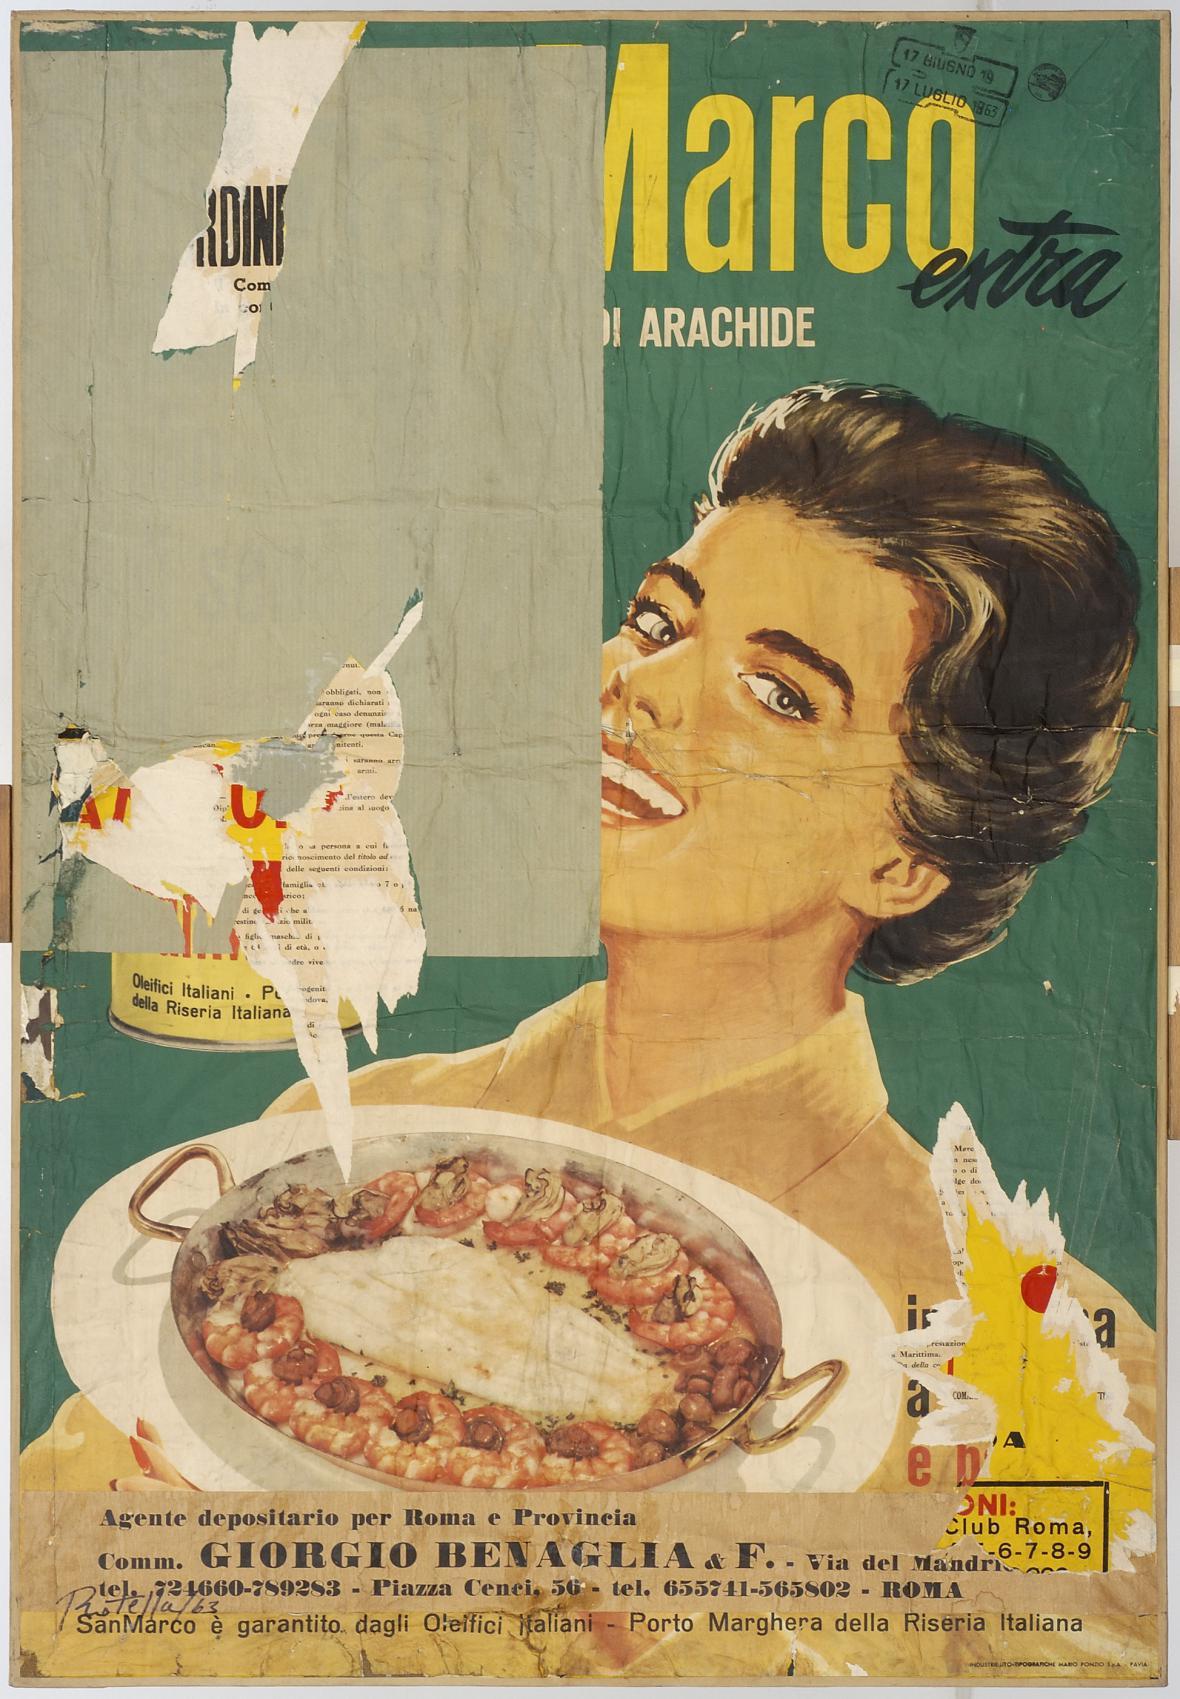 Mimmo Rotella / Araschidina, 1963